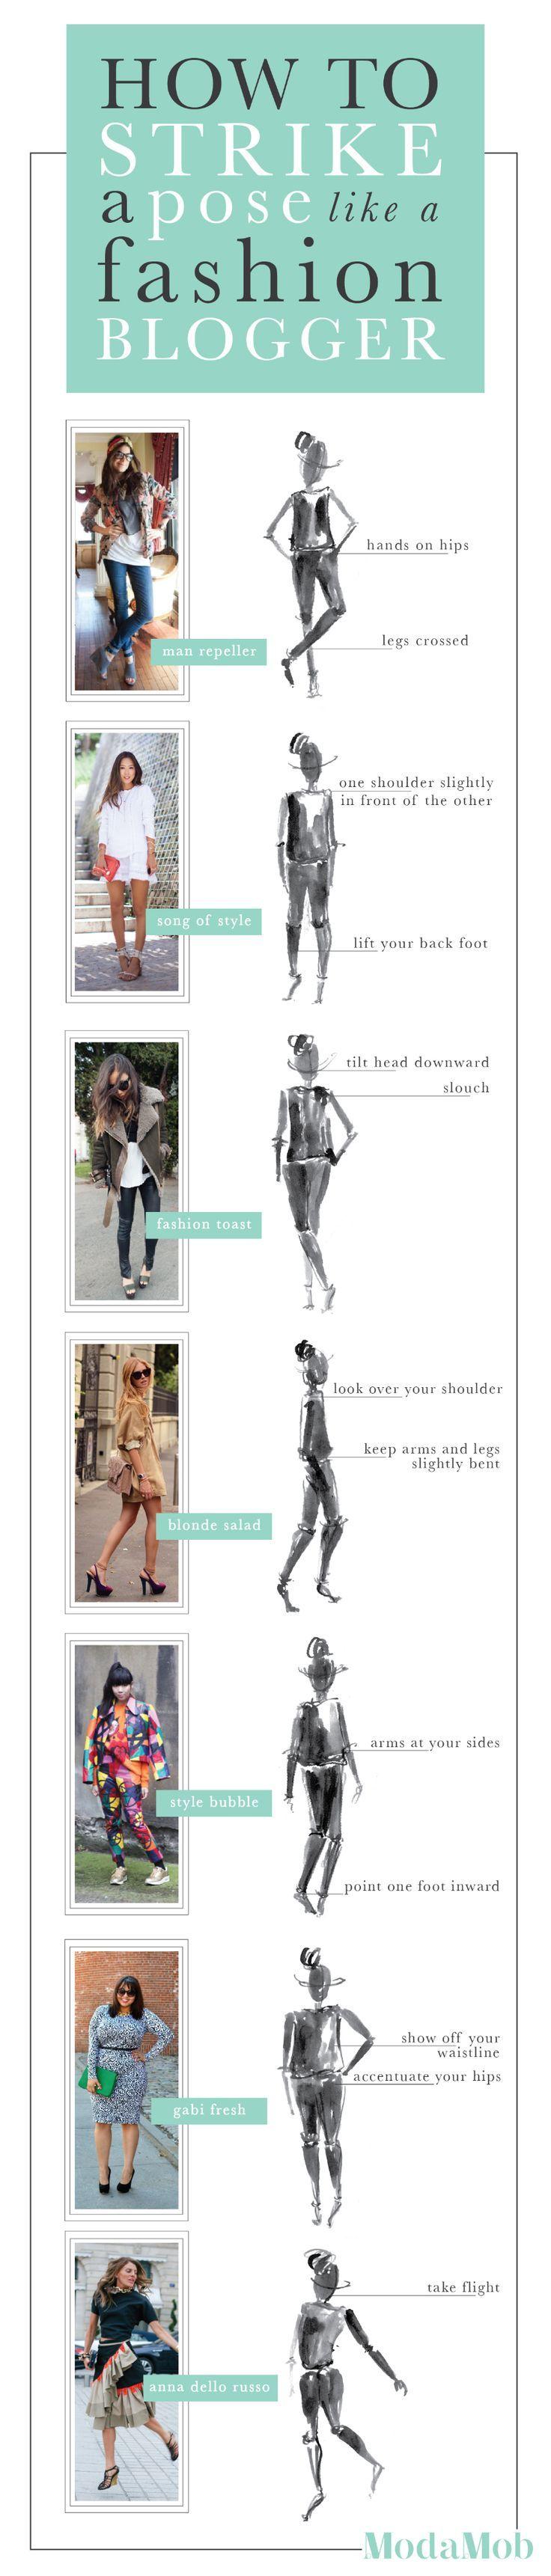 nice How to: Poseren als een echte fashion blogger by http://www.globalfashionista.xyz/fashion-poses/how-to-poseren-als-een-echte-fashion-blogger/